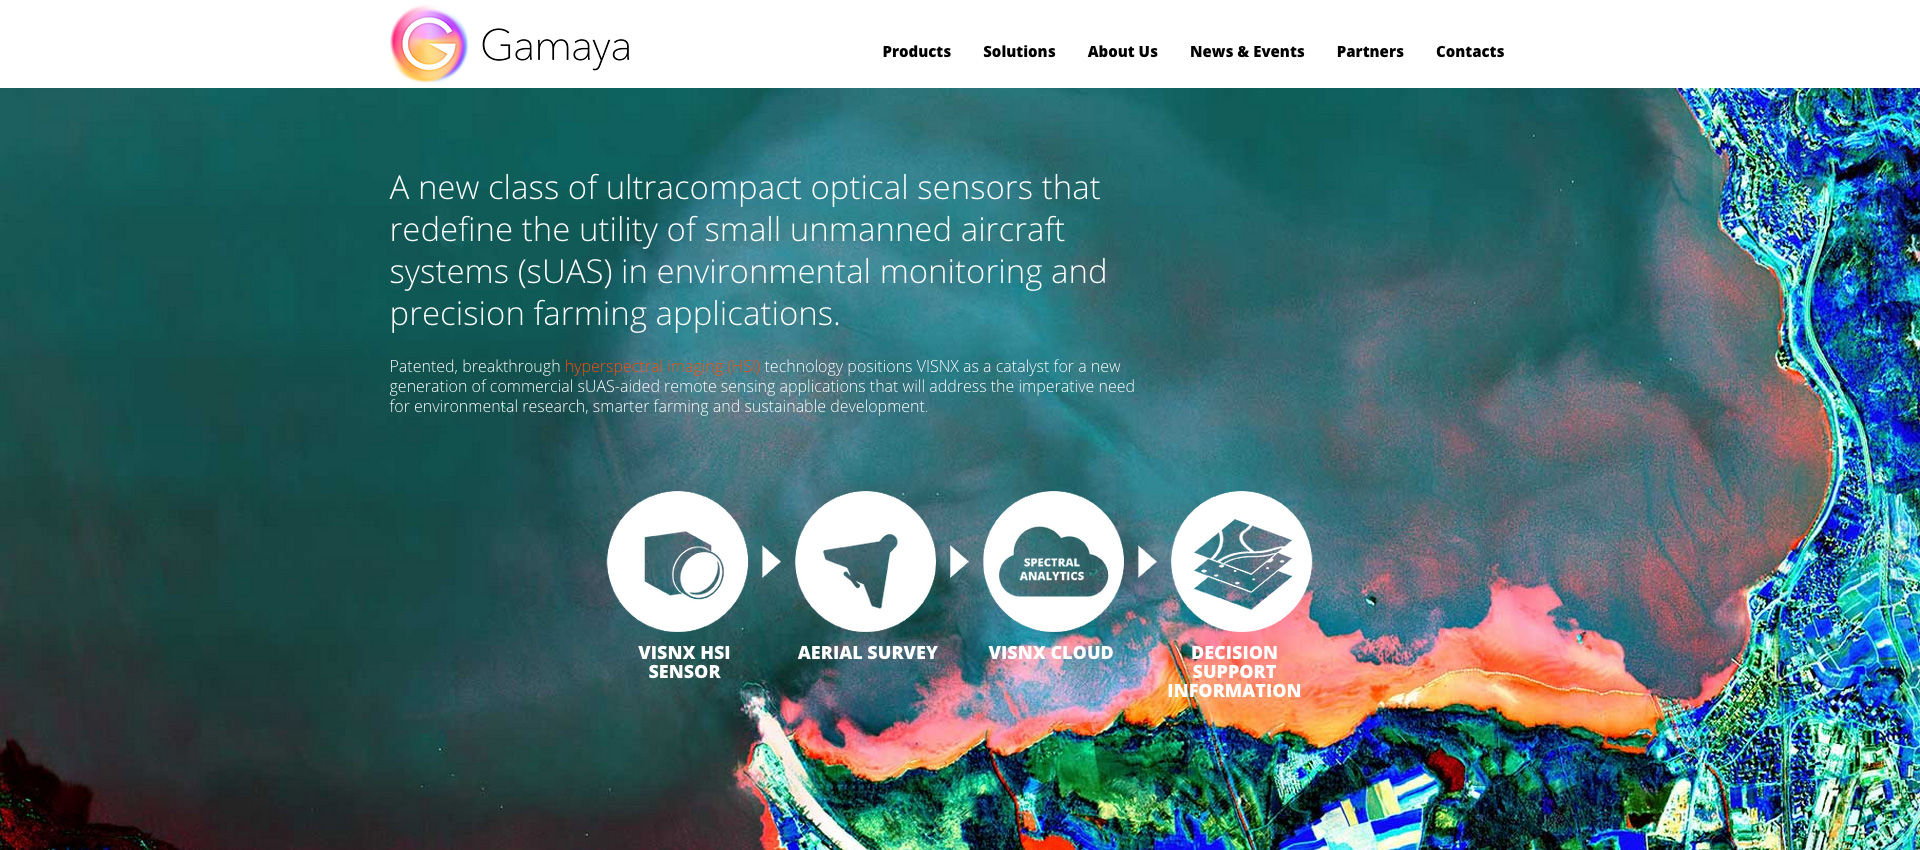 Разработка логотипа для компании Gamaya фото f_3085485a3256da1c.jpg